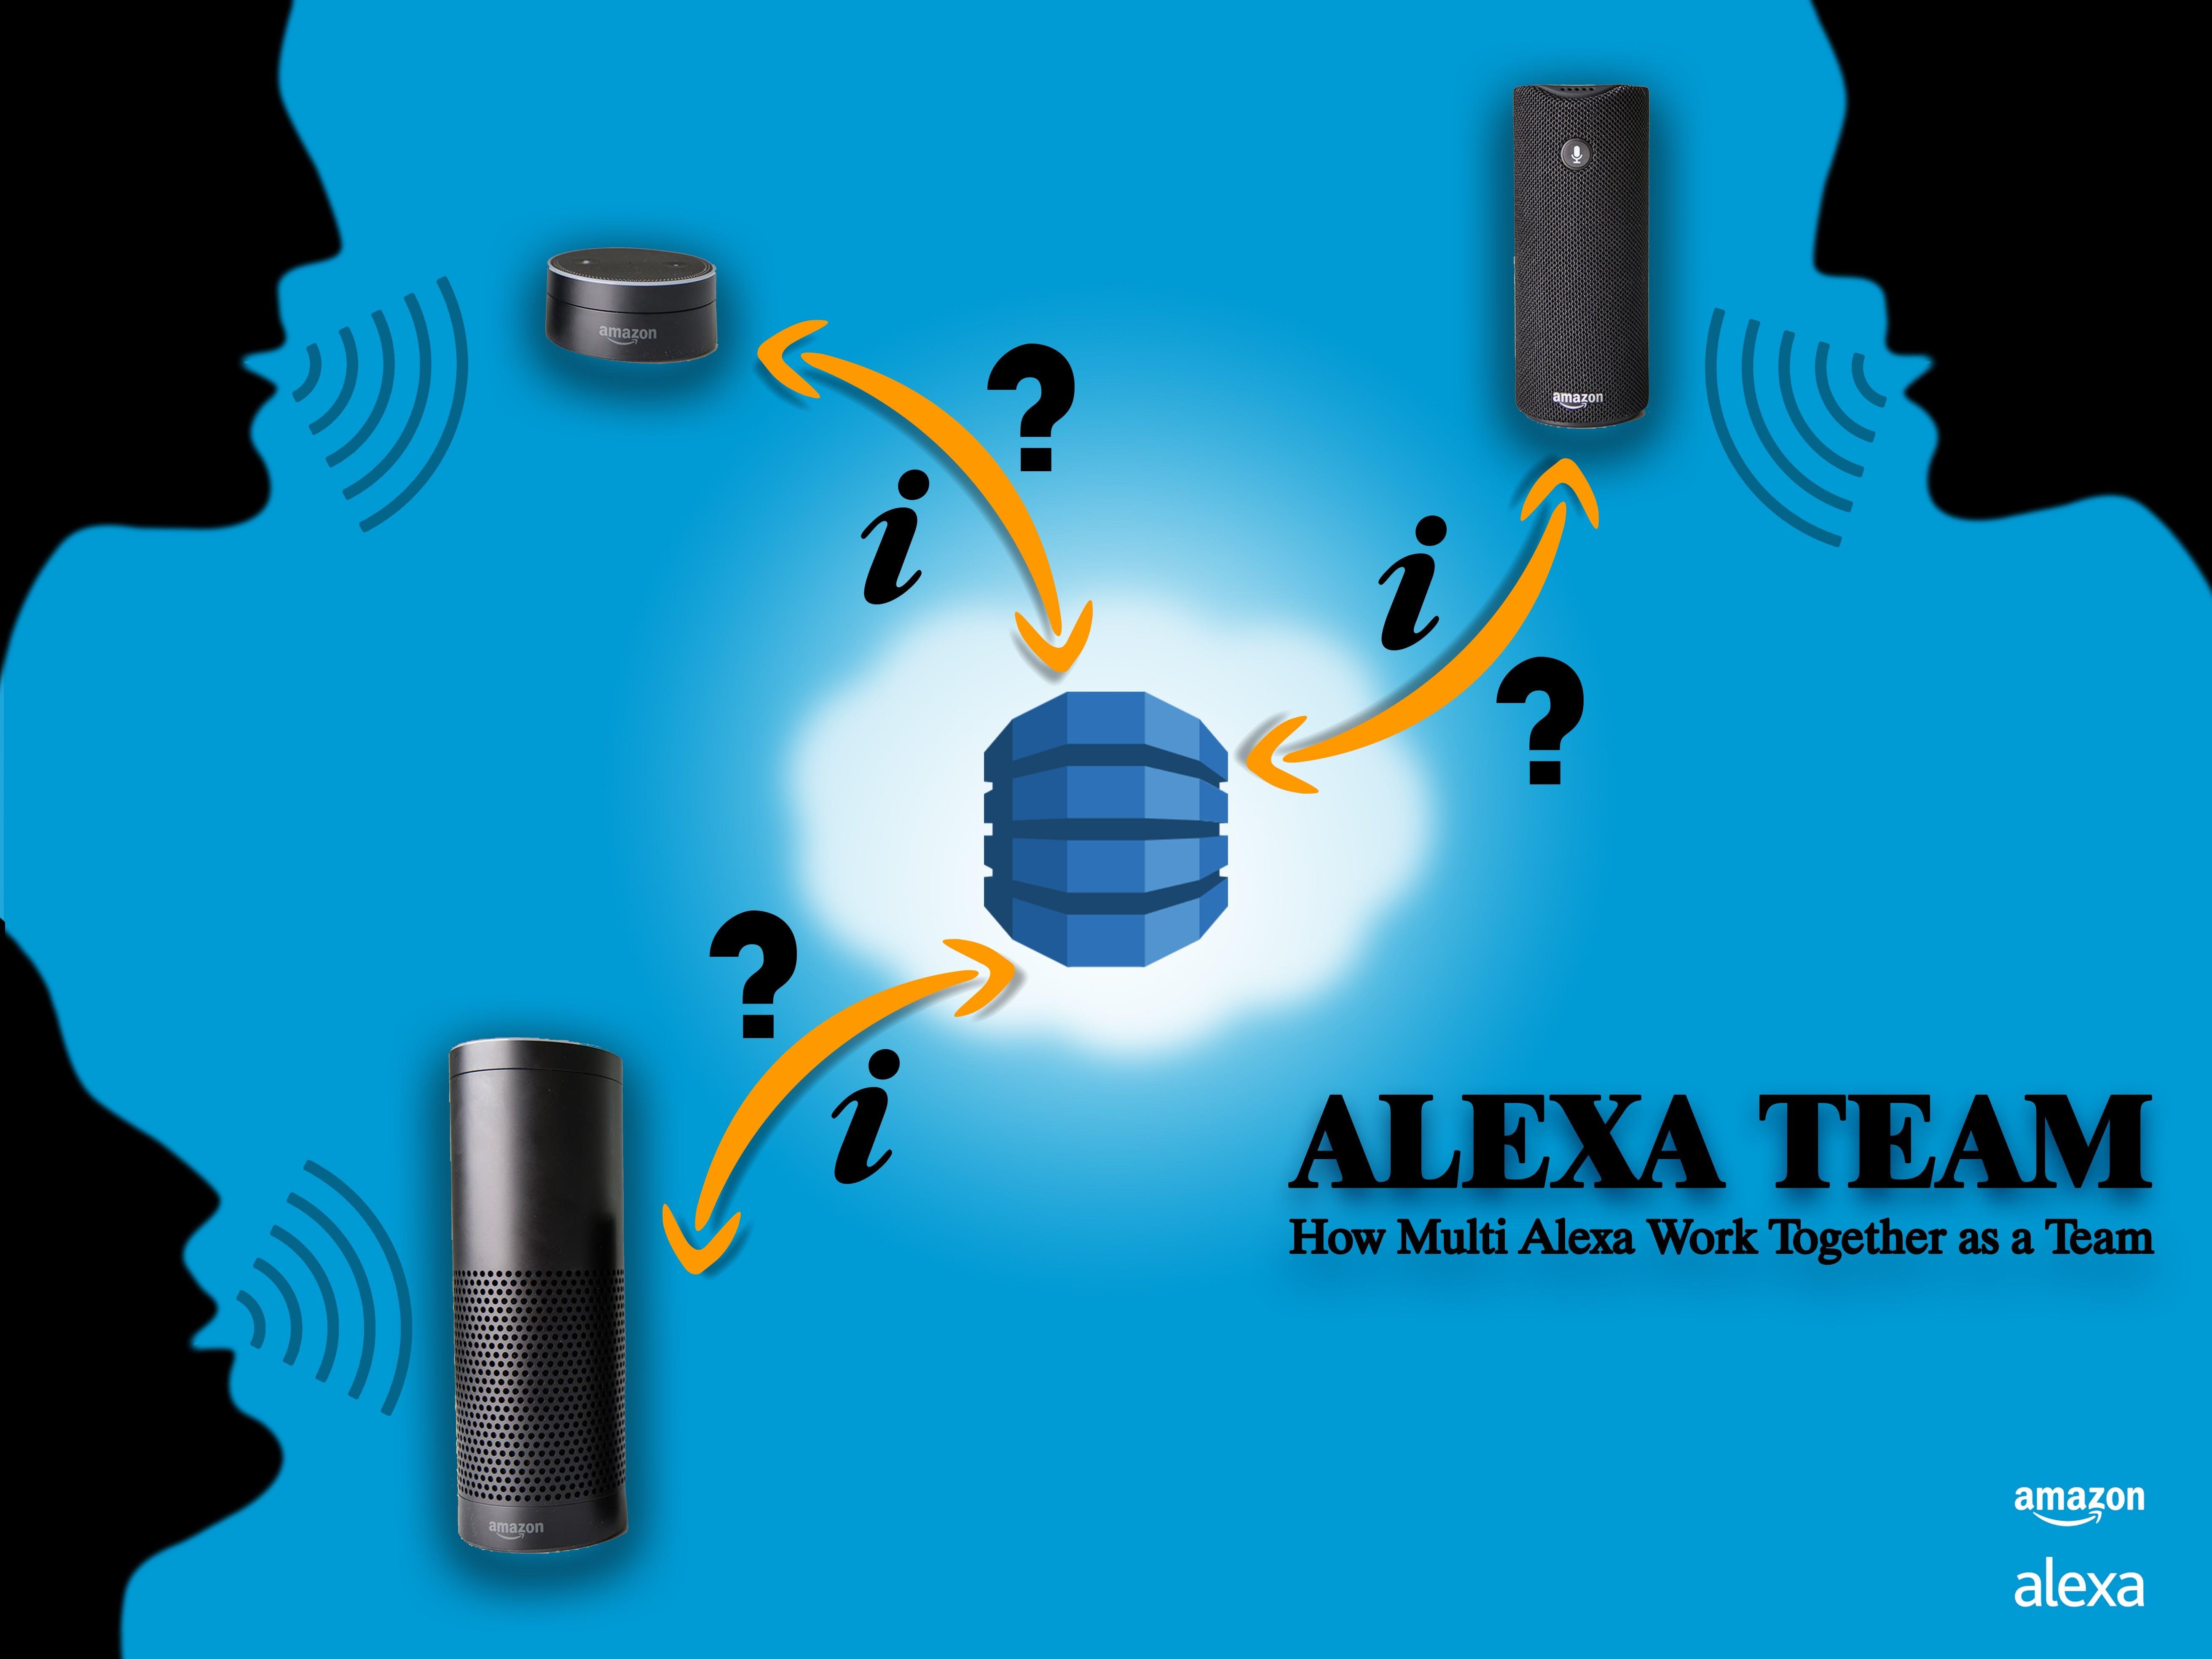 Alexa Team - How Multi Alexas Work Together As a Team